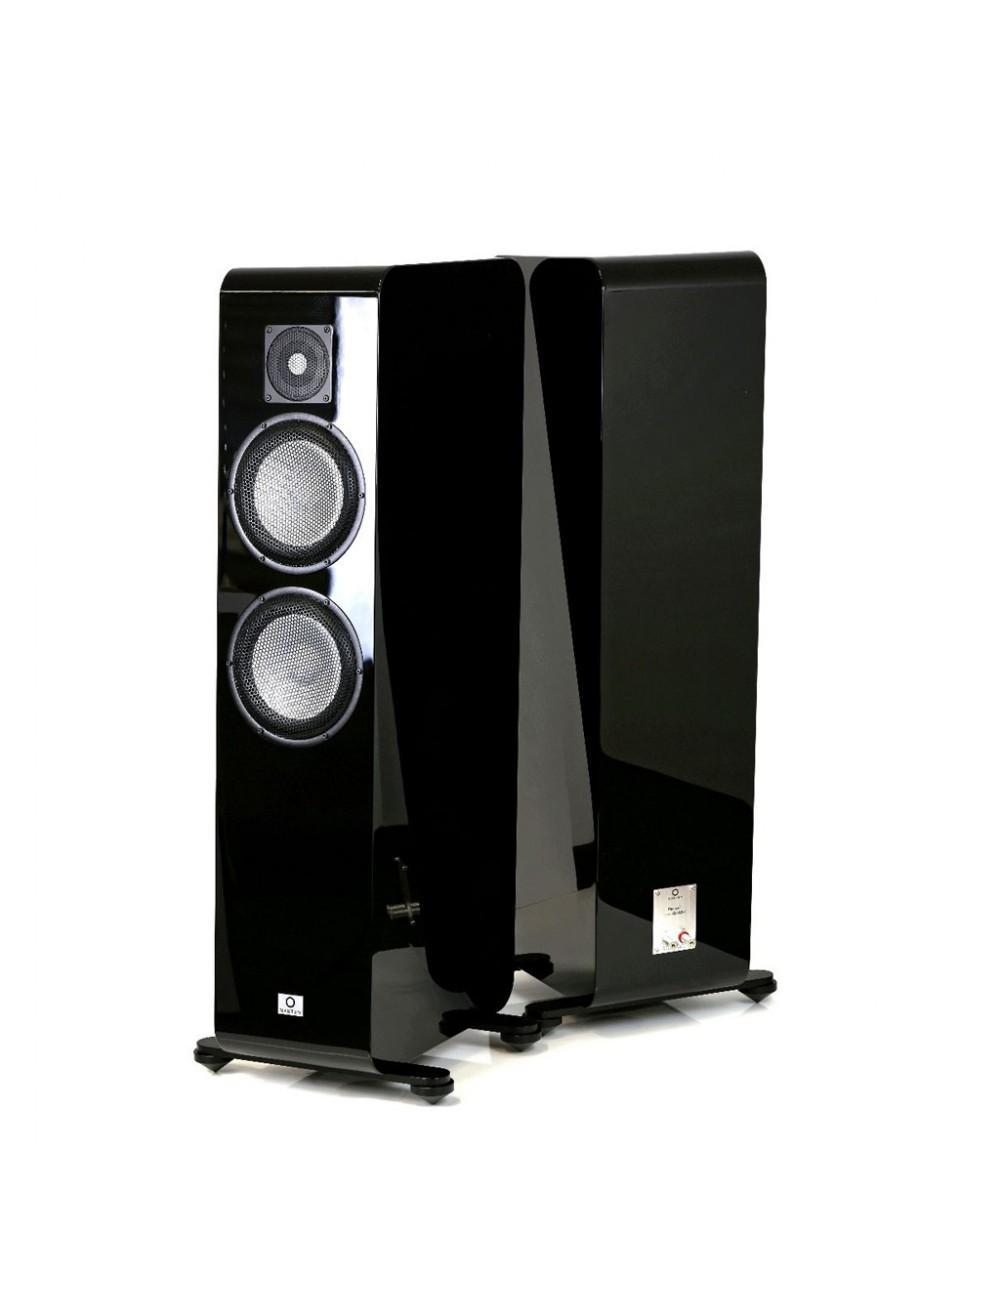 diffusori acustici da pavimento per hifi, Marten Django L, finitura black gloss